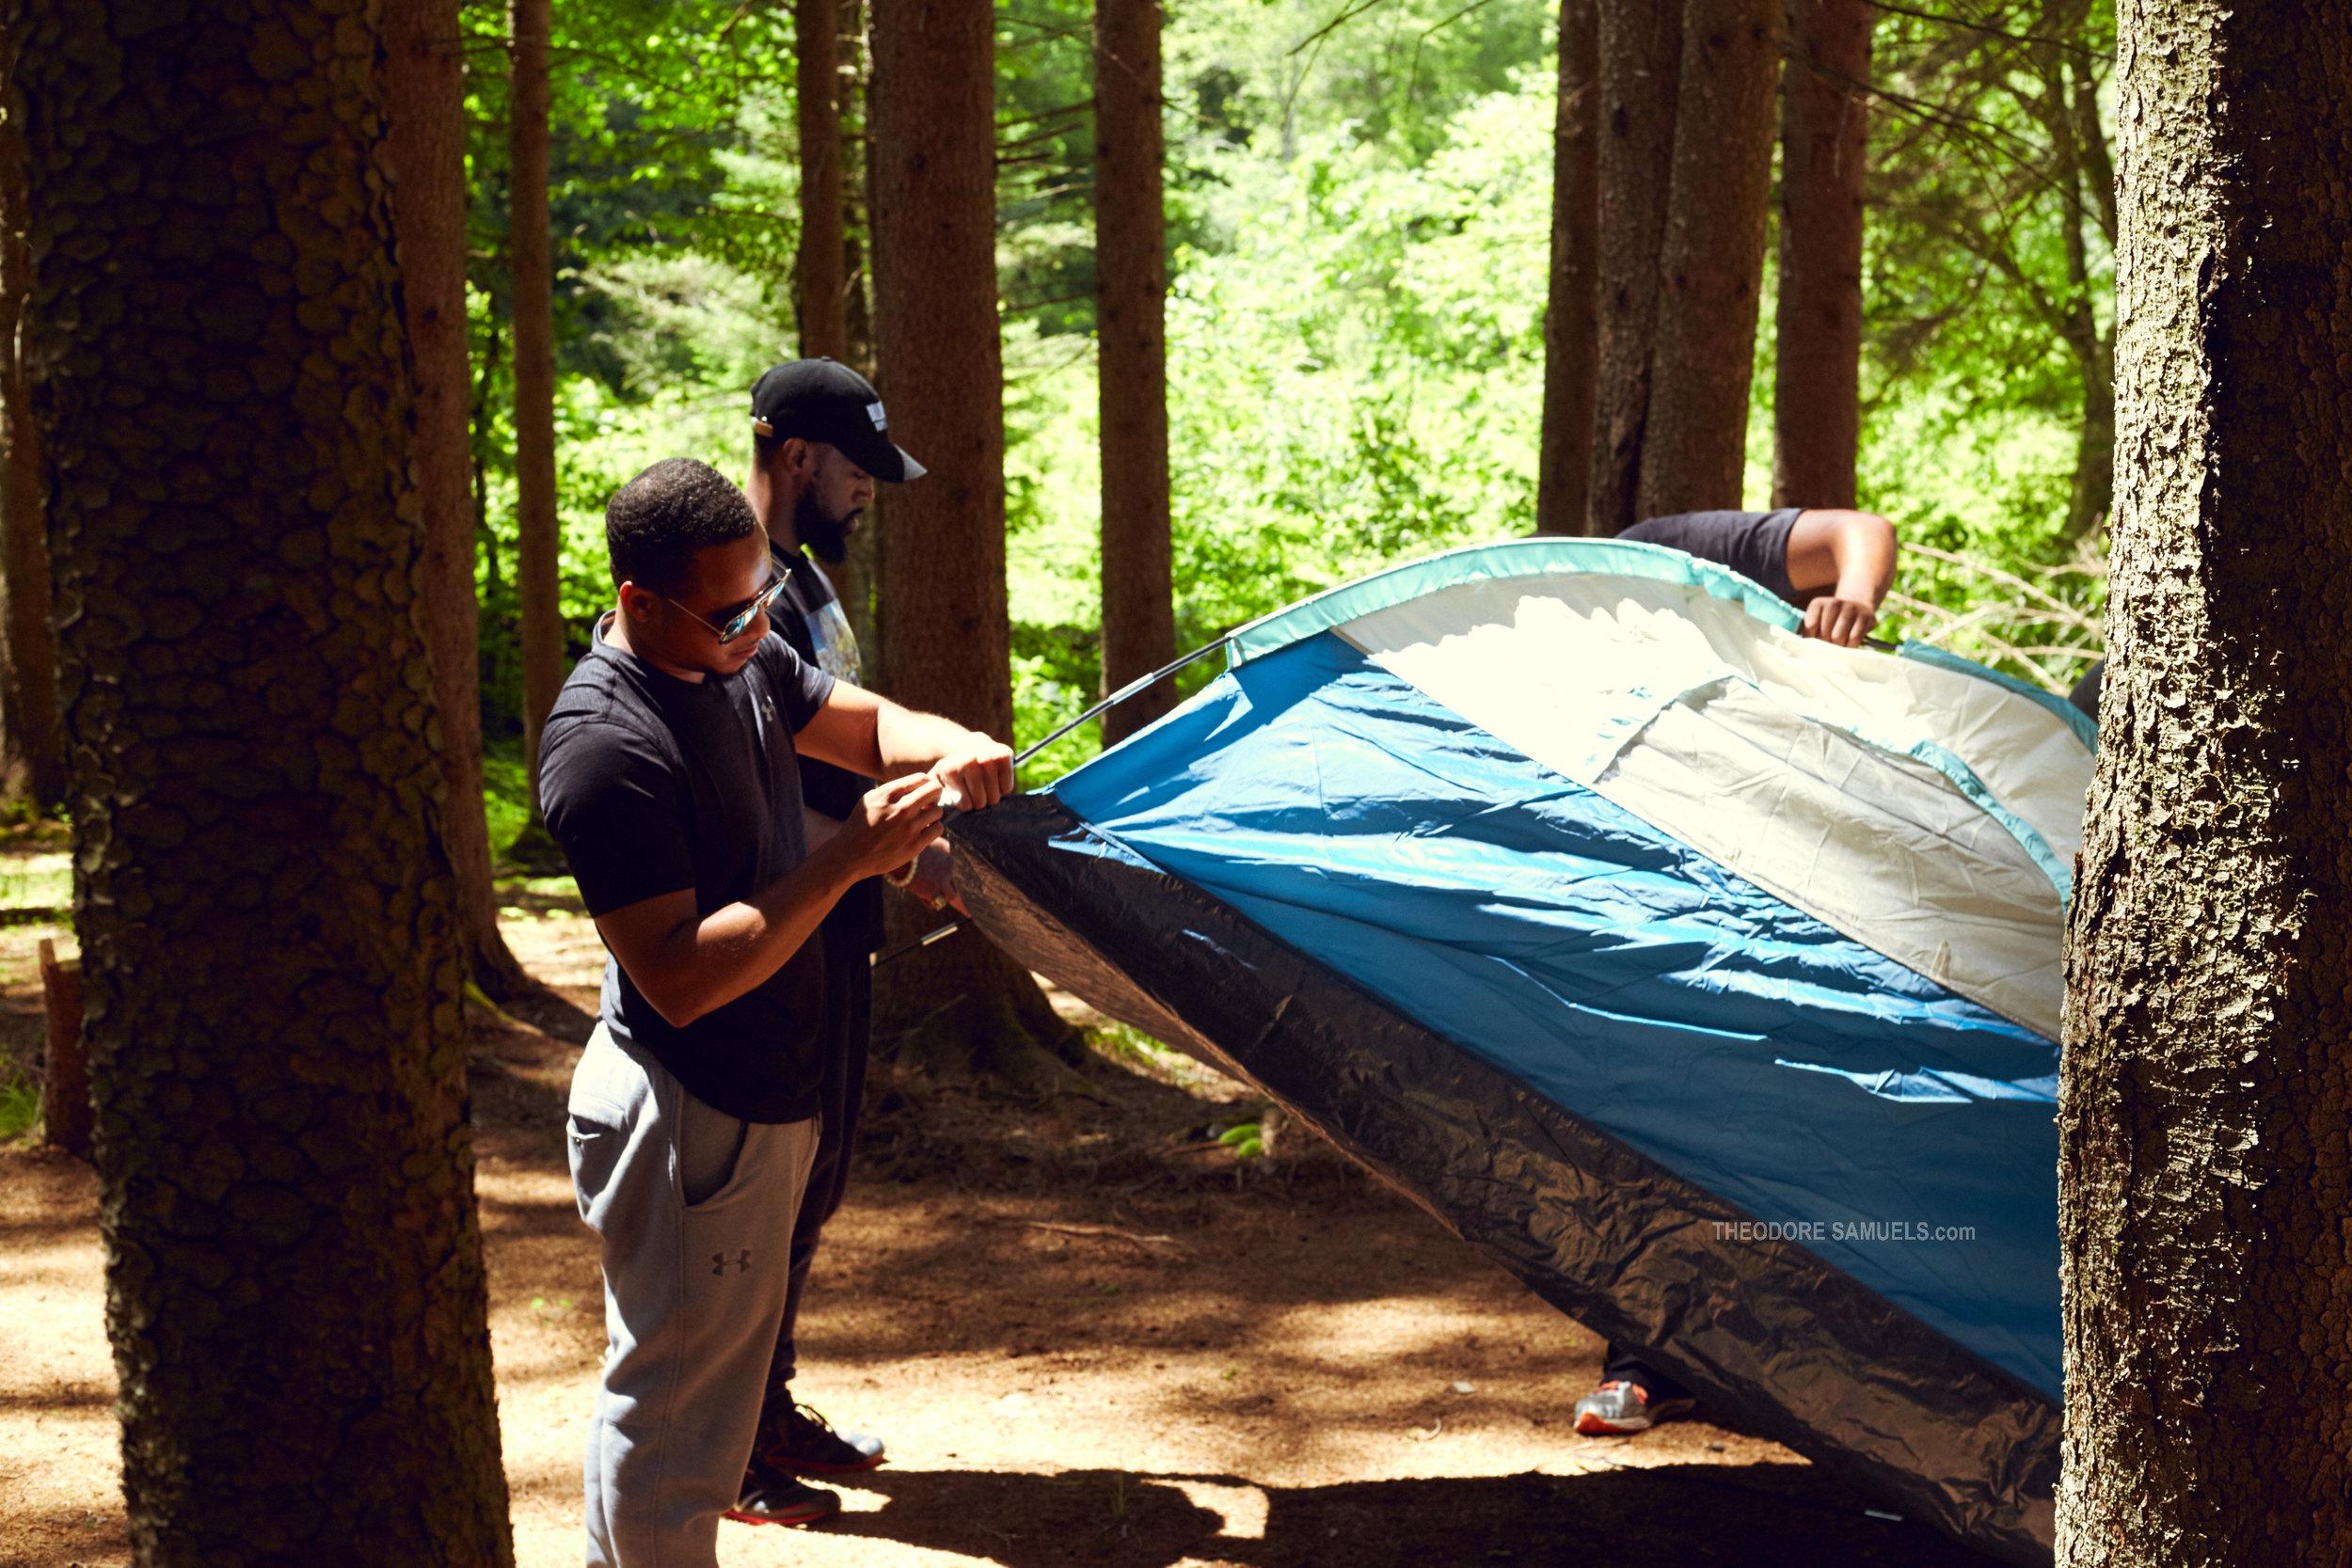 170625_Mastermind Camping_001.jpg